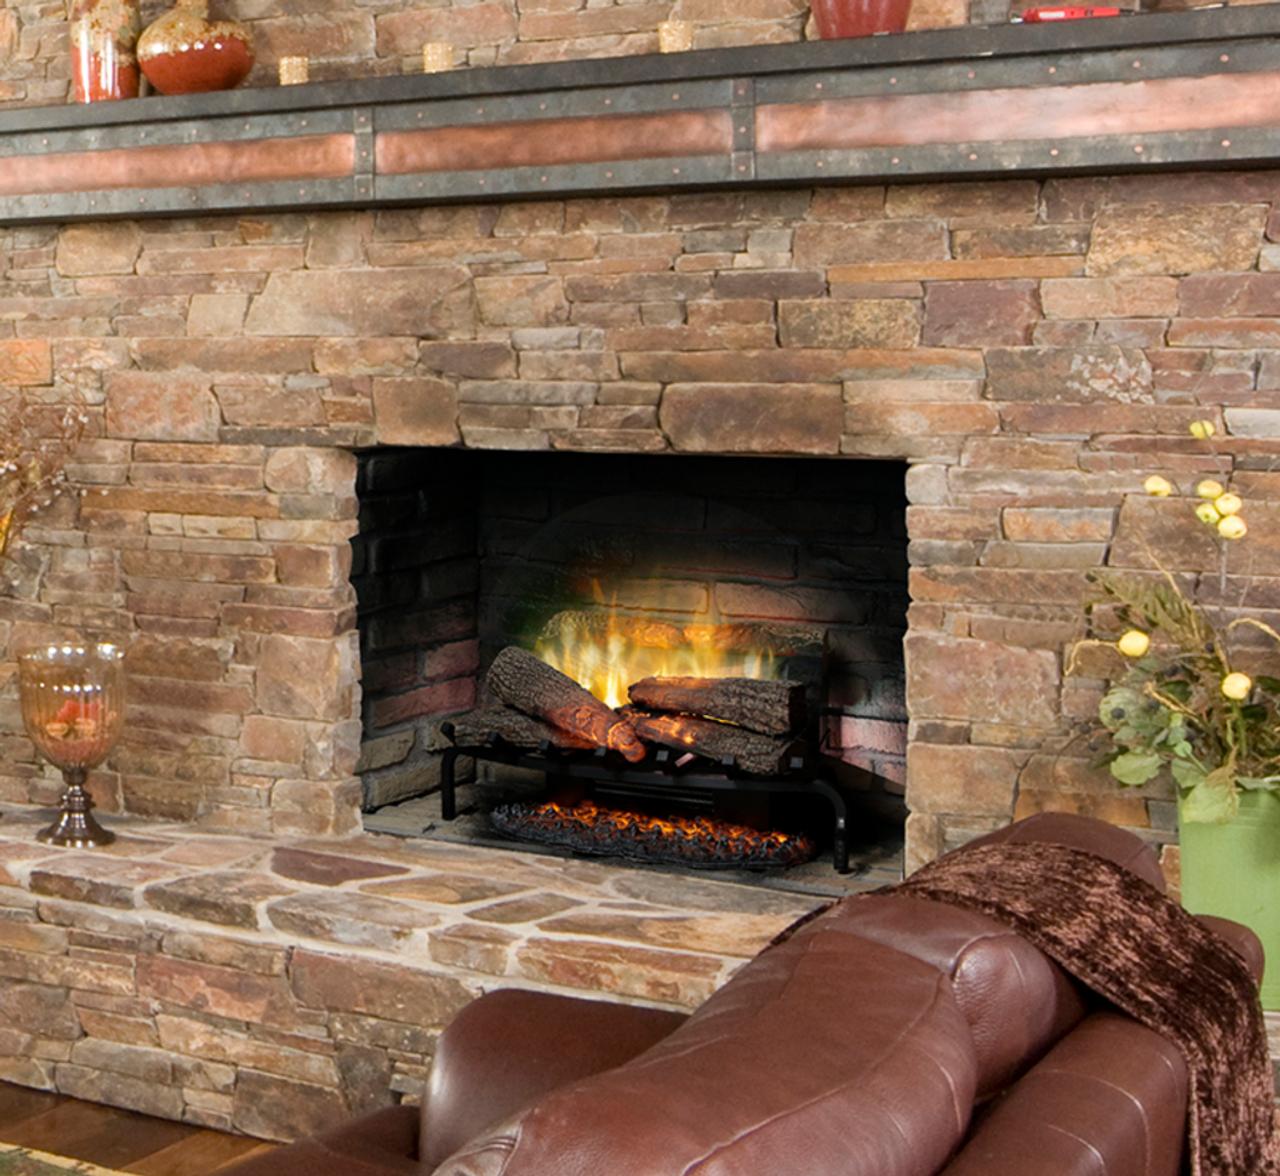 Outstanding Dimplex 25 Revillusion Masonry Fireplace Electric Log Set Rlg25 Interior Design Ideas Gentotryabchikinfo